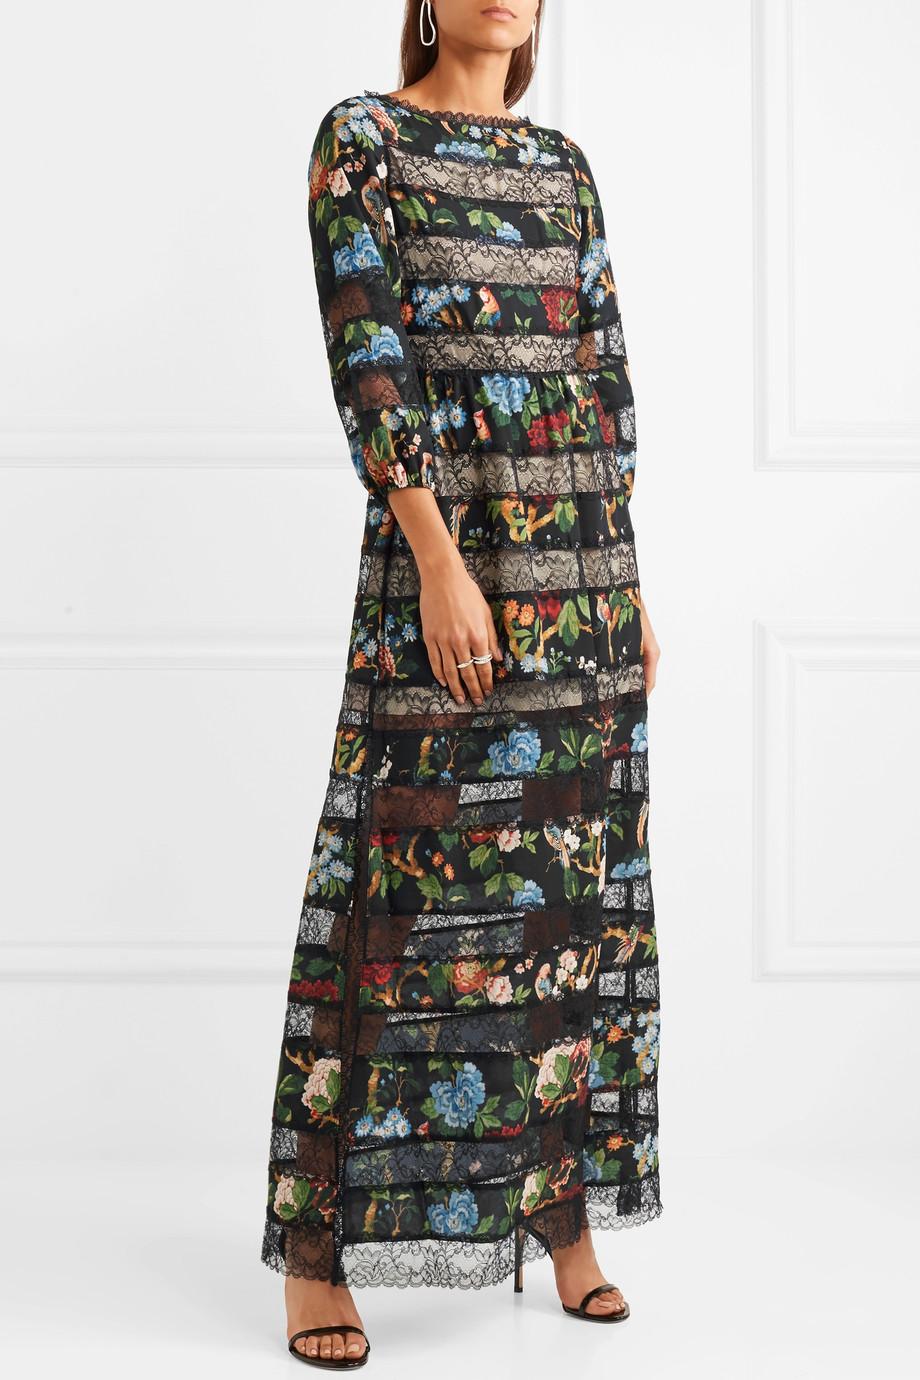 alice and olivia fall 2018 print dress